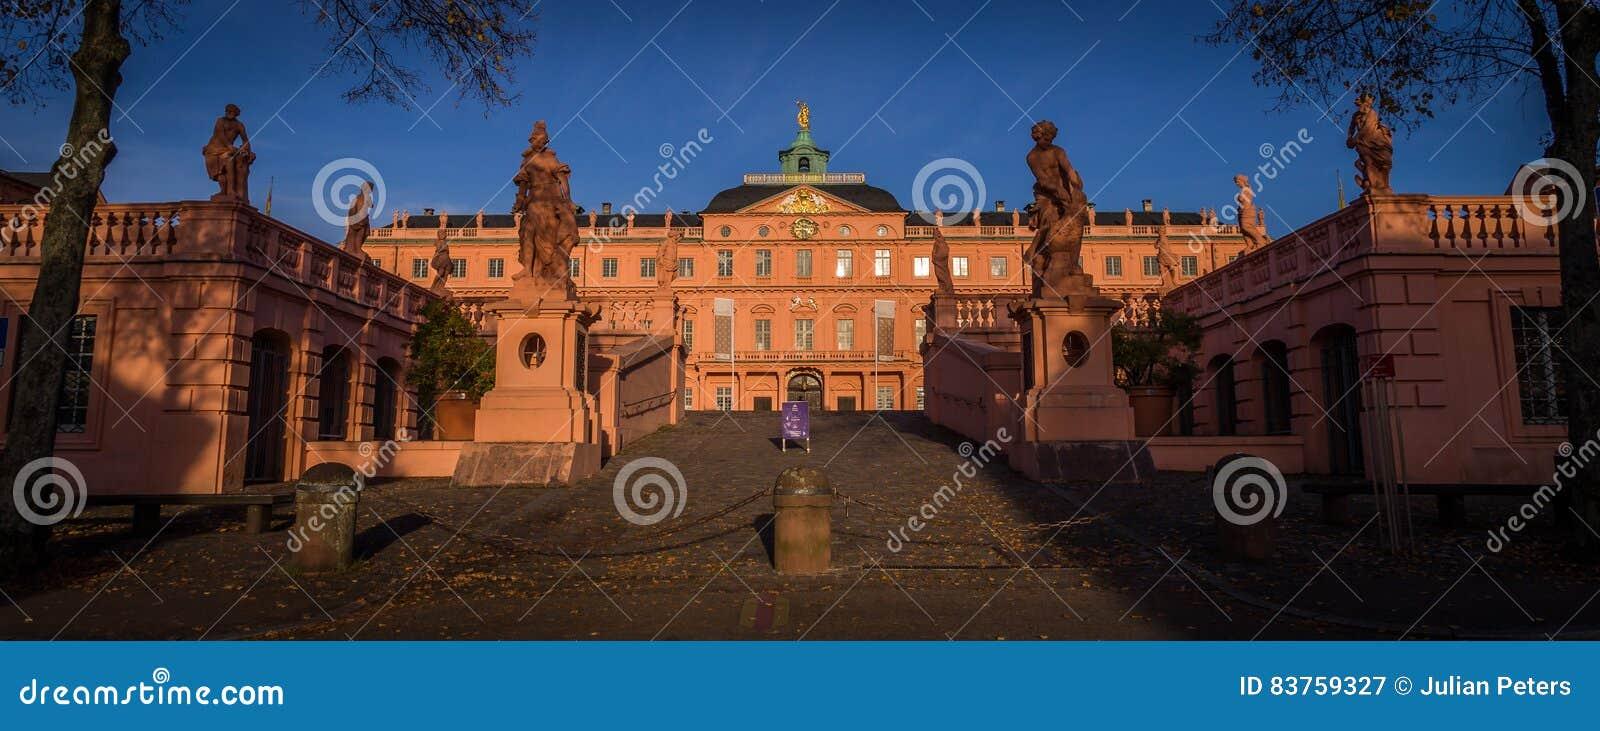 Rastatt Schloss, Baden, Deutschland